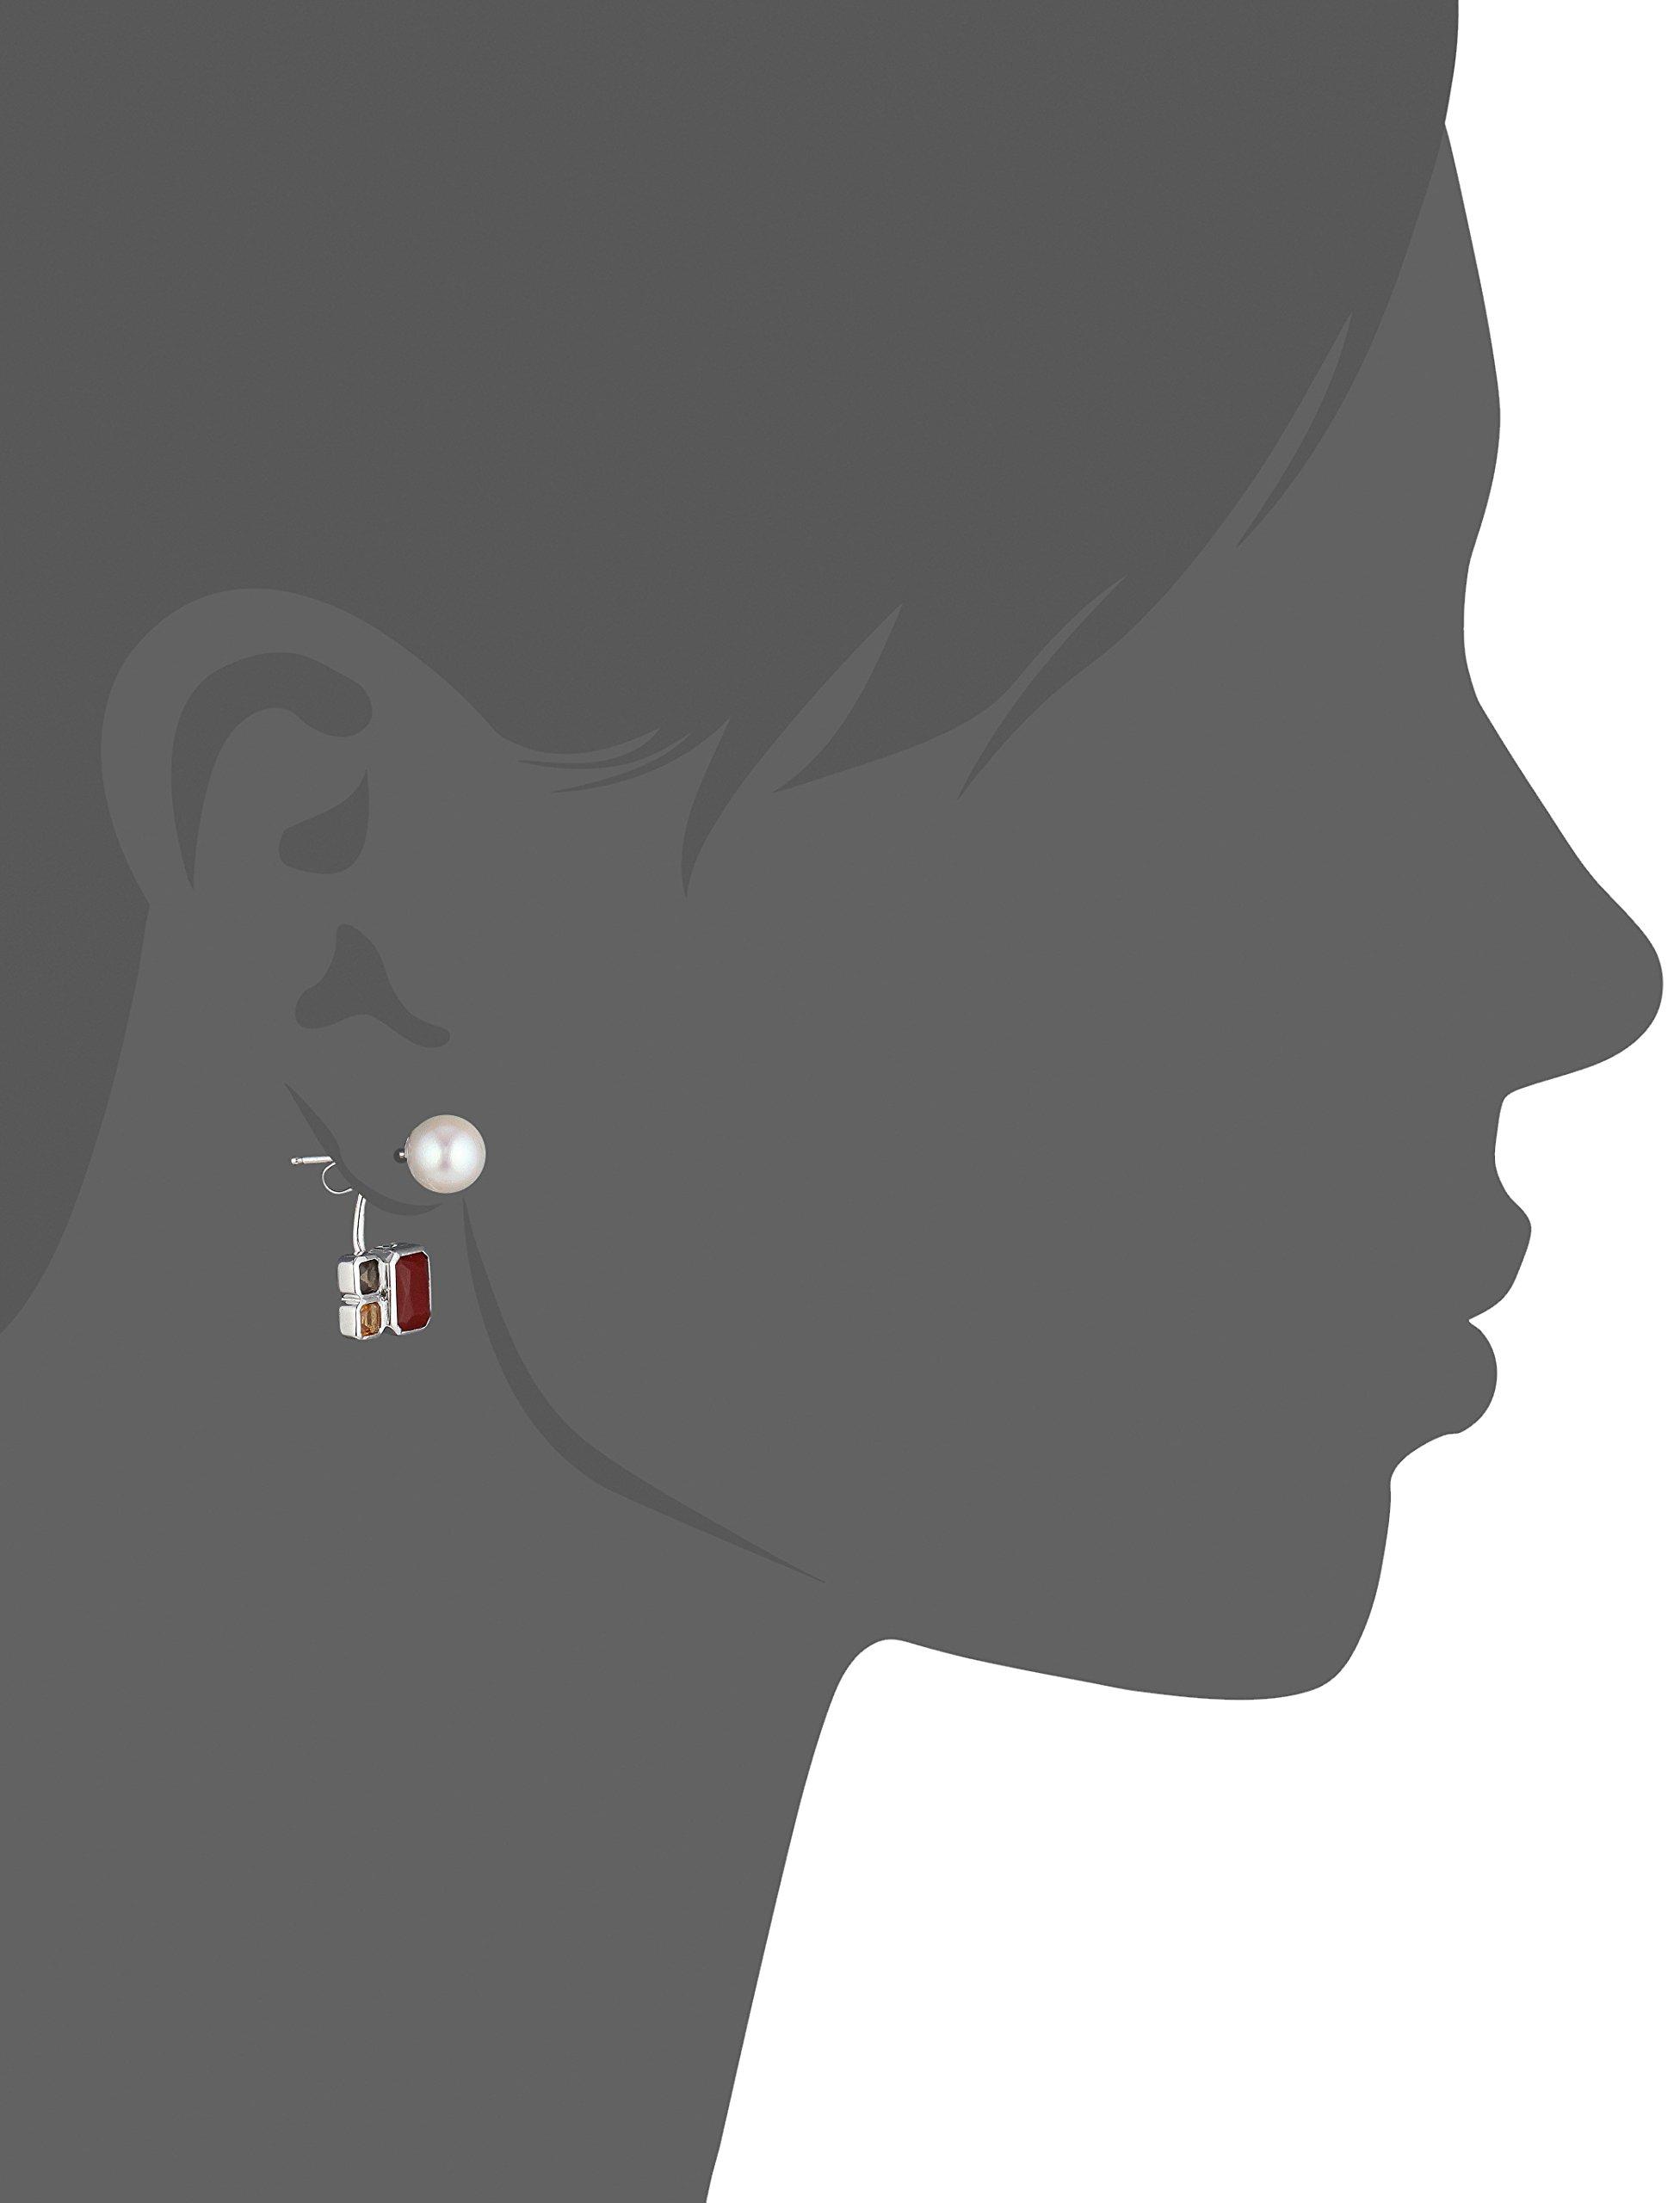 TARA Pearls 7X7.5mm Akoya Pearls, Smoky Quartz, Citrine and Red Agate Jacket Sterling Silver Earring Jackets by TARA Pearls (Image #2)